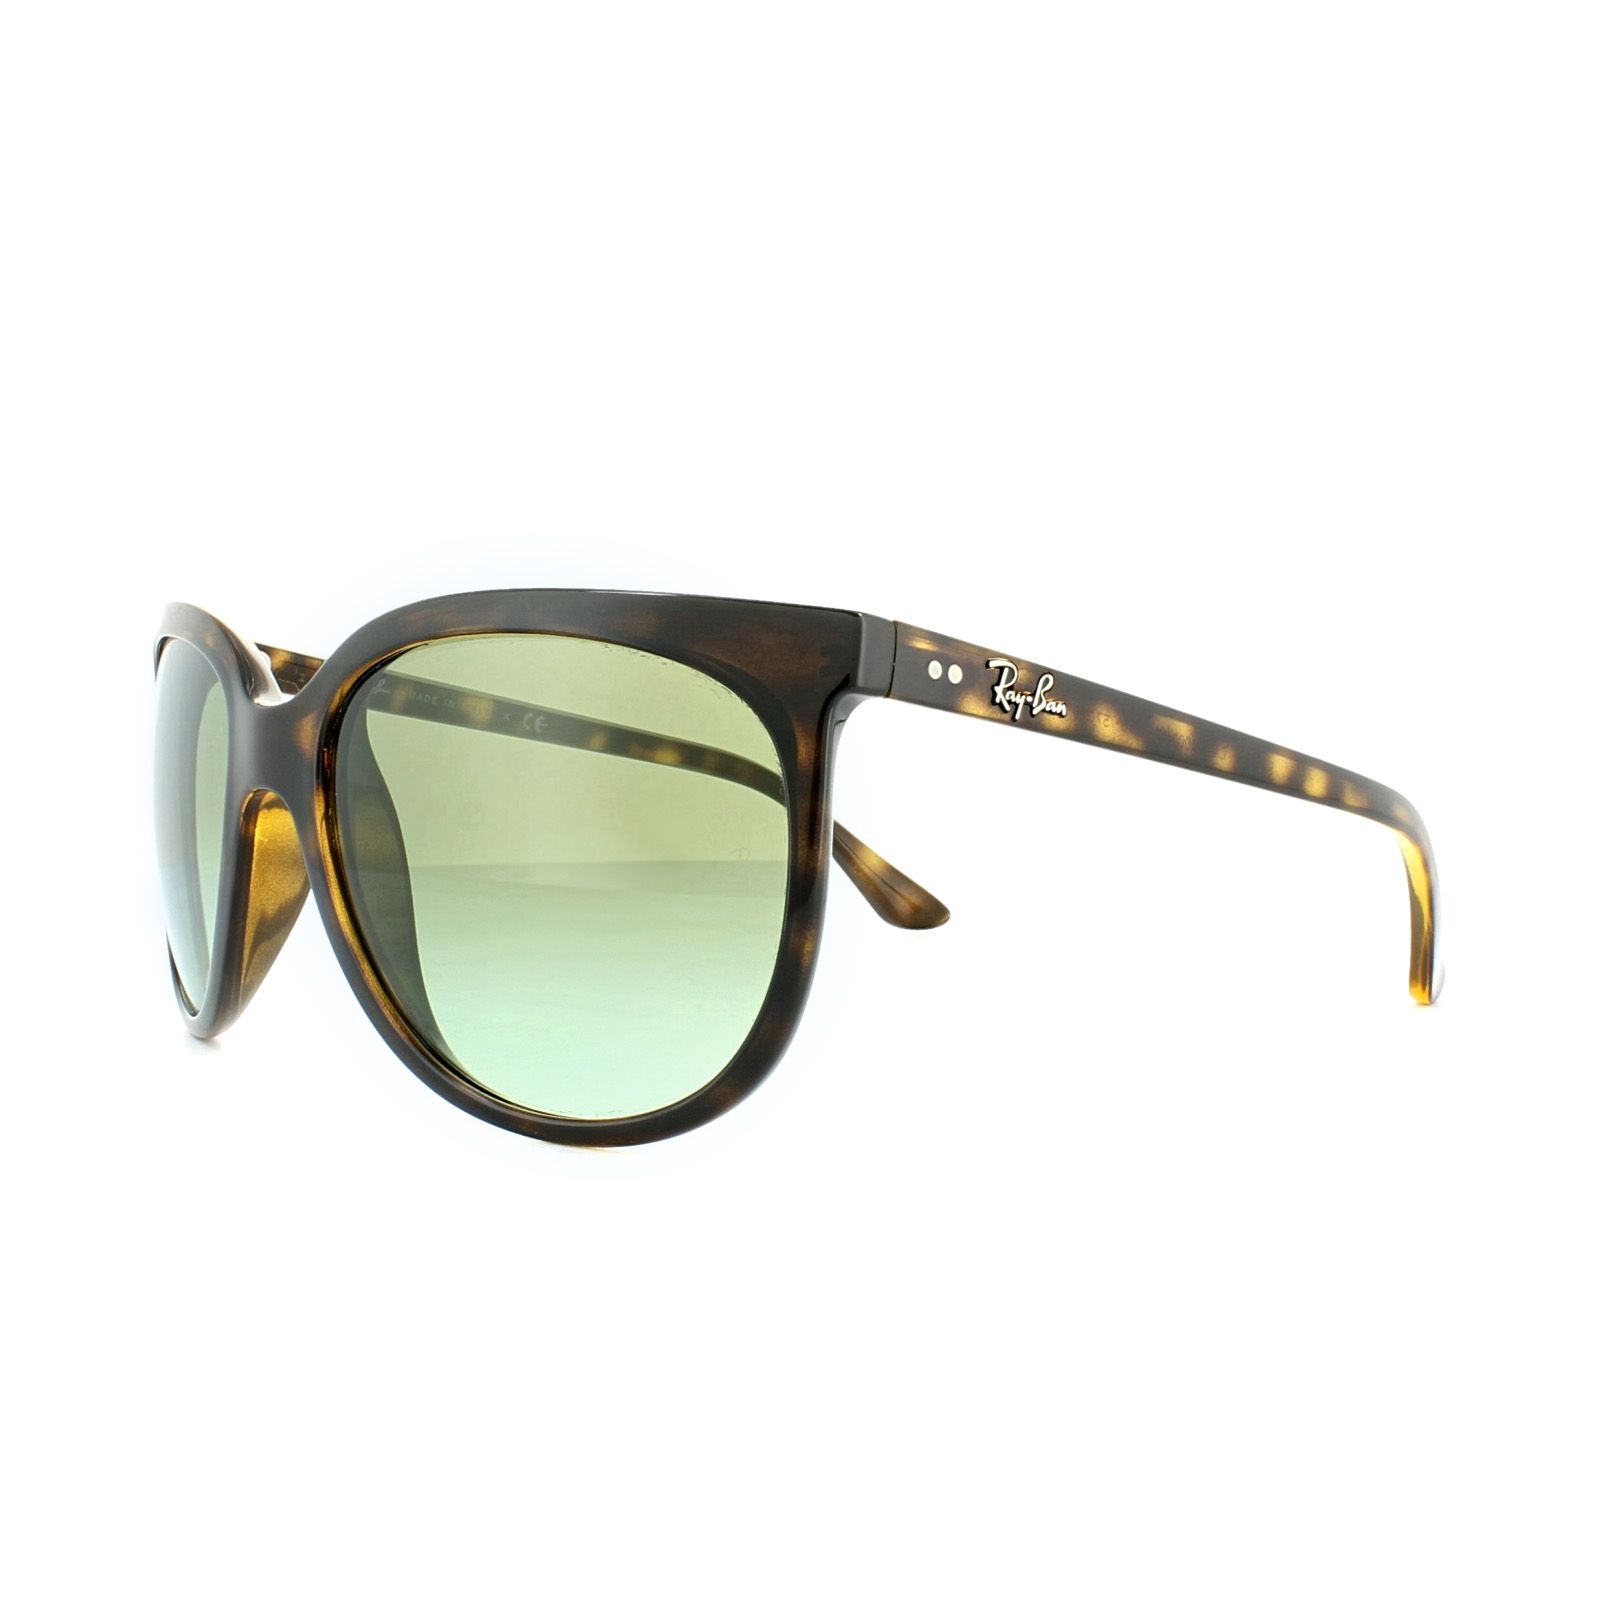 RAY BAN RAY-BAN Damen Sonnenbrille »CATS 1000 RB4126«, braun, 710/A6 - braun/ braun